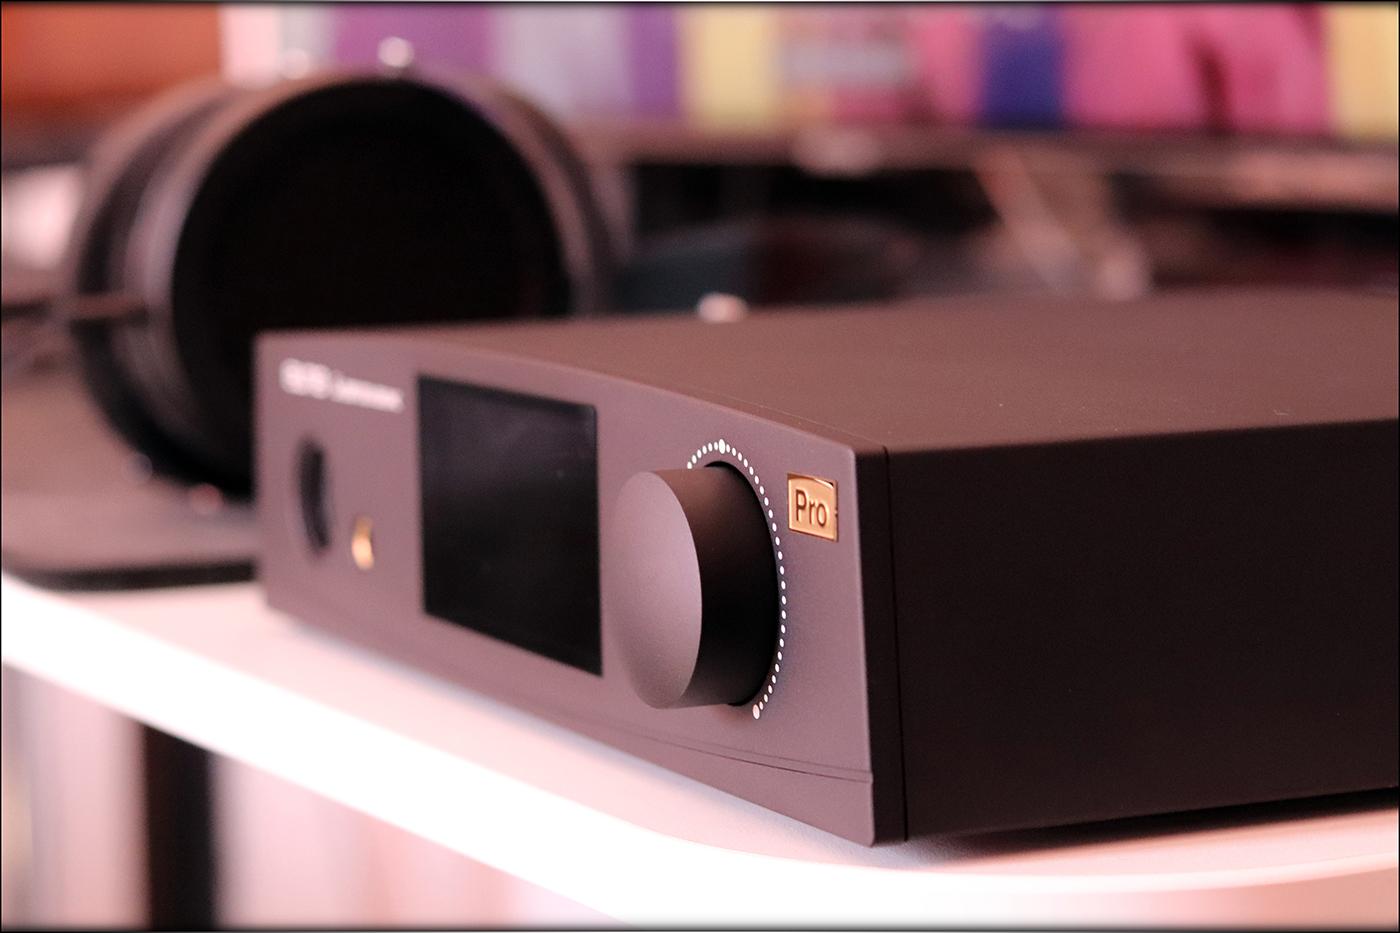 Aune-S6-PRO-DAC-Balanced-DAC-Headphone-Amplifier-Surround-Gaming-32-Bit-Flagship-In-Depth-Review-Audiophile-Heaven-11.jpg